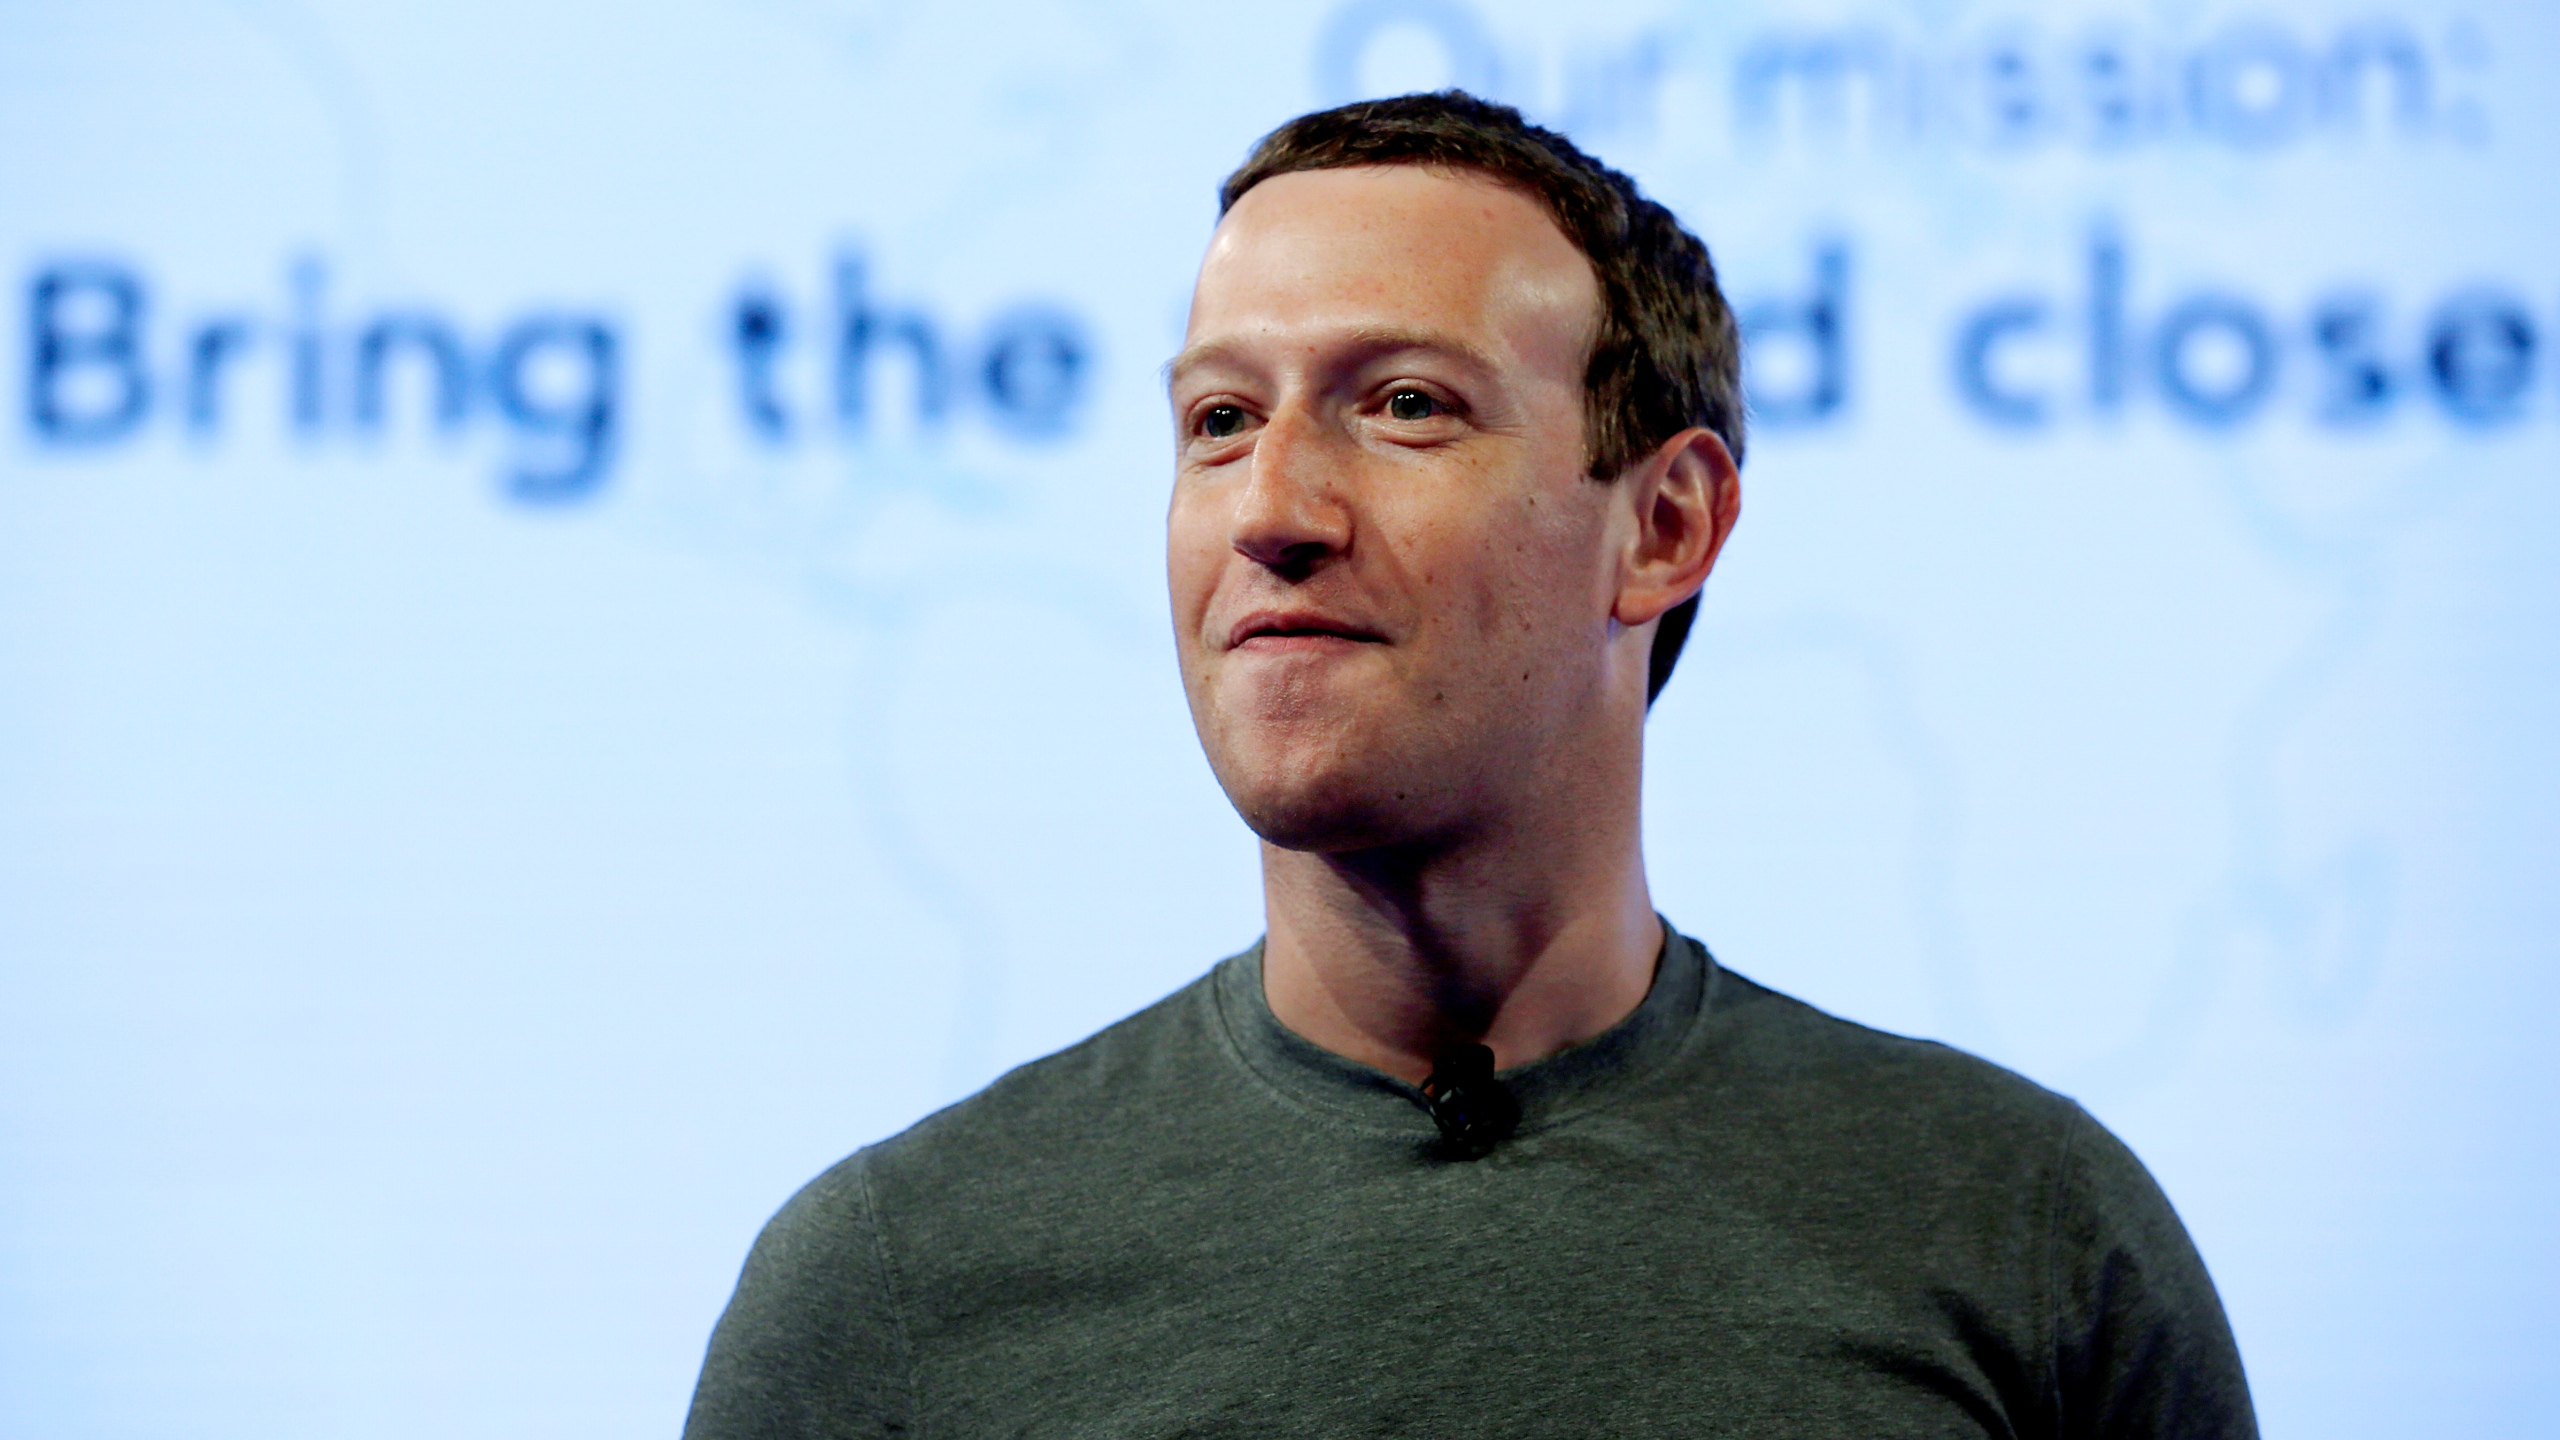 Facebook_Cambridge_Analytica_37711-159532.jpg25705835